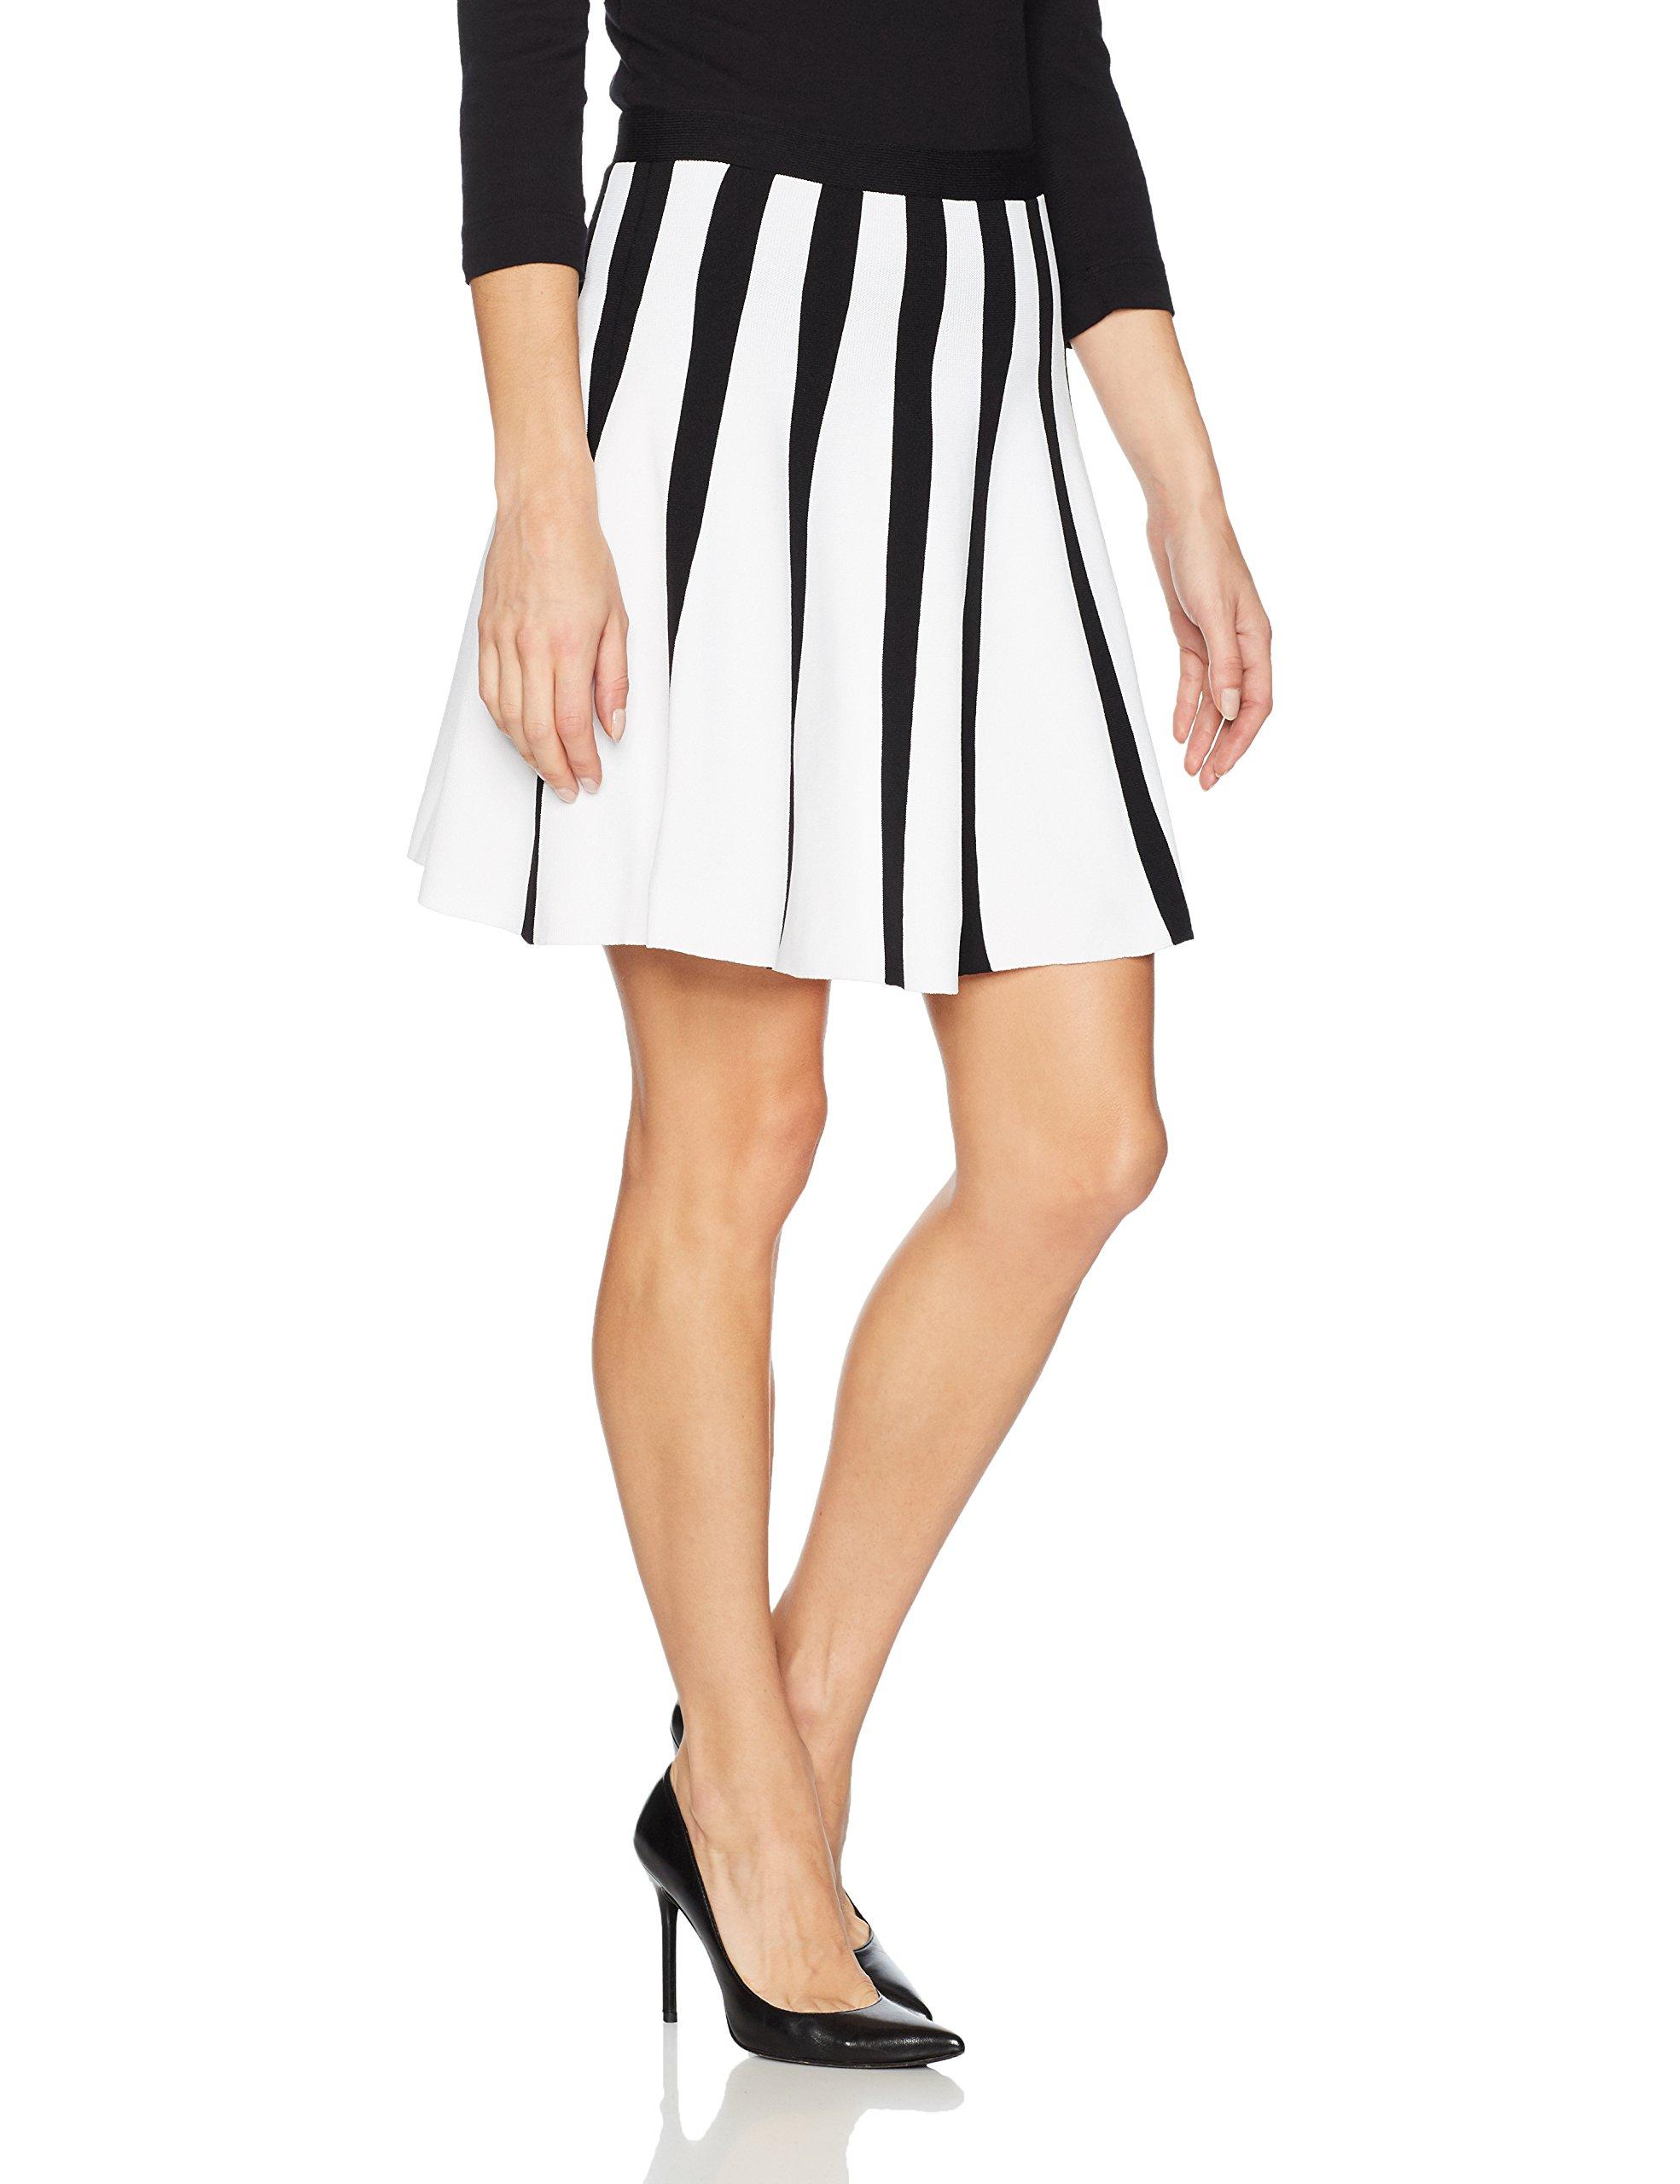 A|X Armani Exchange Women's Striped Pleated Short Skirt, Black/White, XS